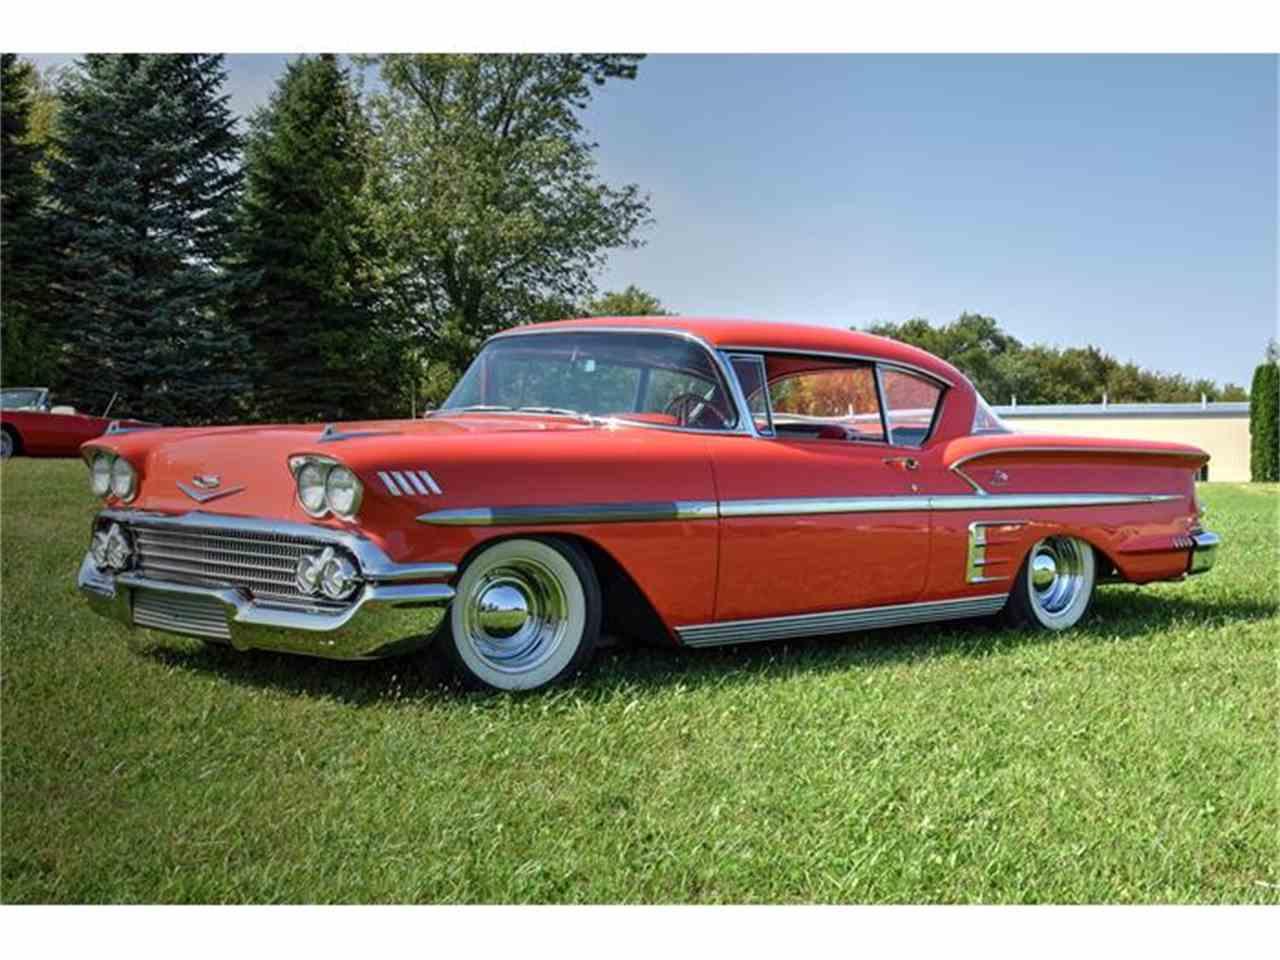 1958 chevrolet impala for sale cc 718900. Black Bedroom Furniture Sets. Home Design Ideas